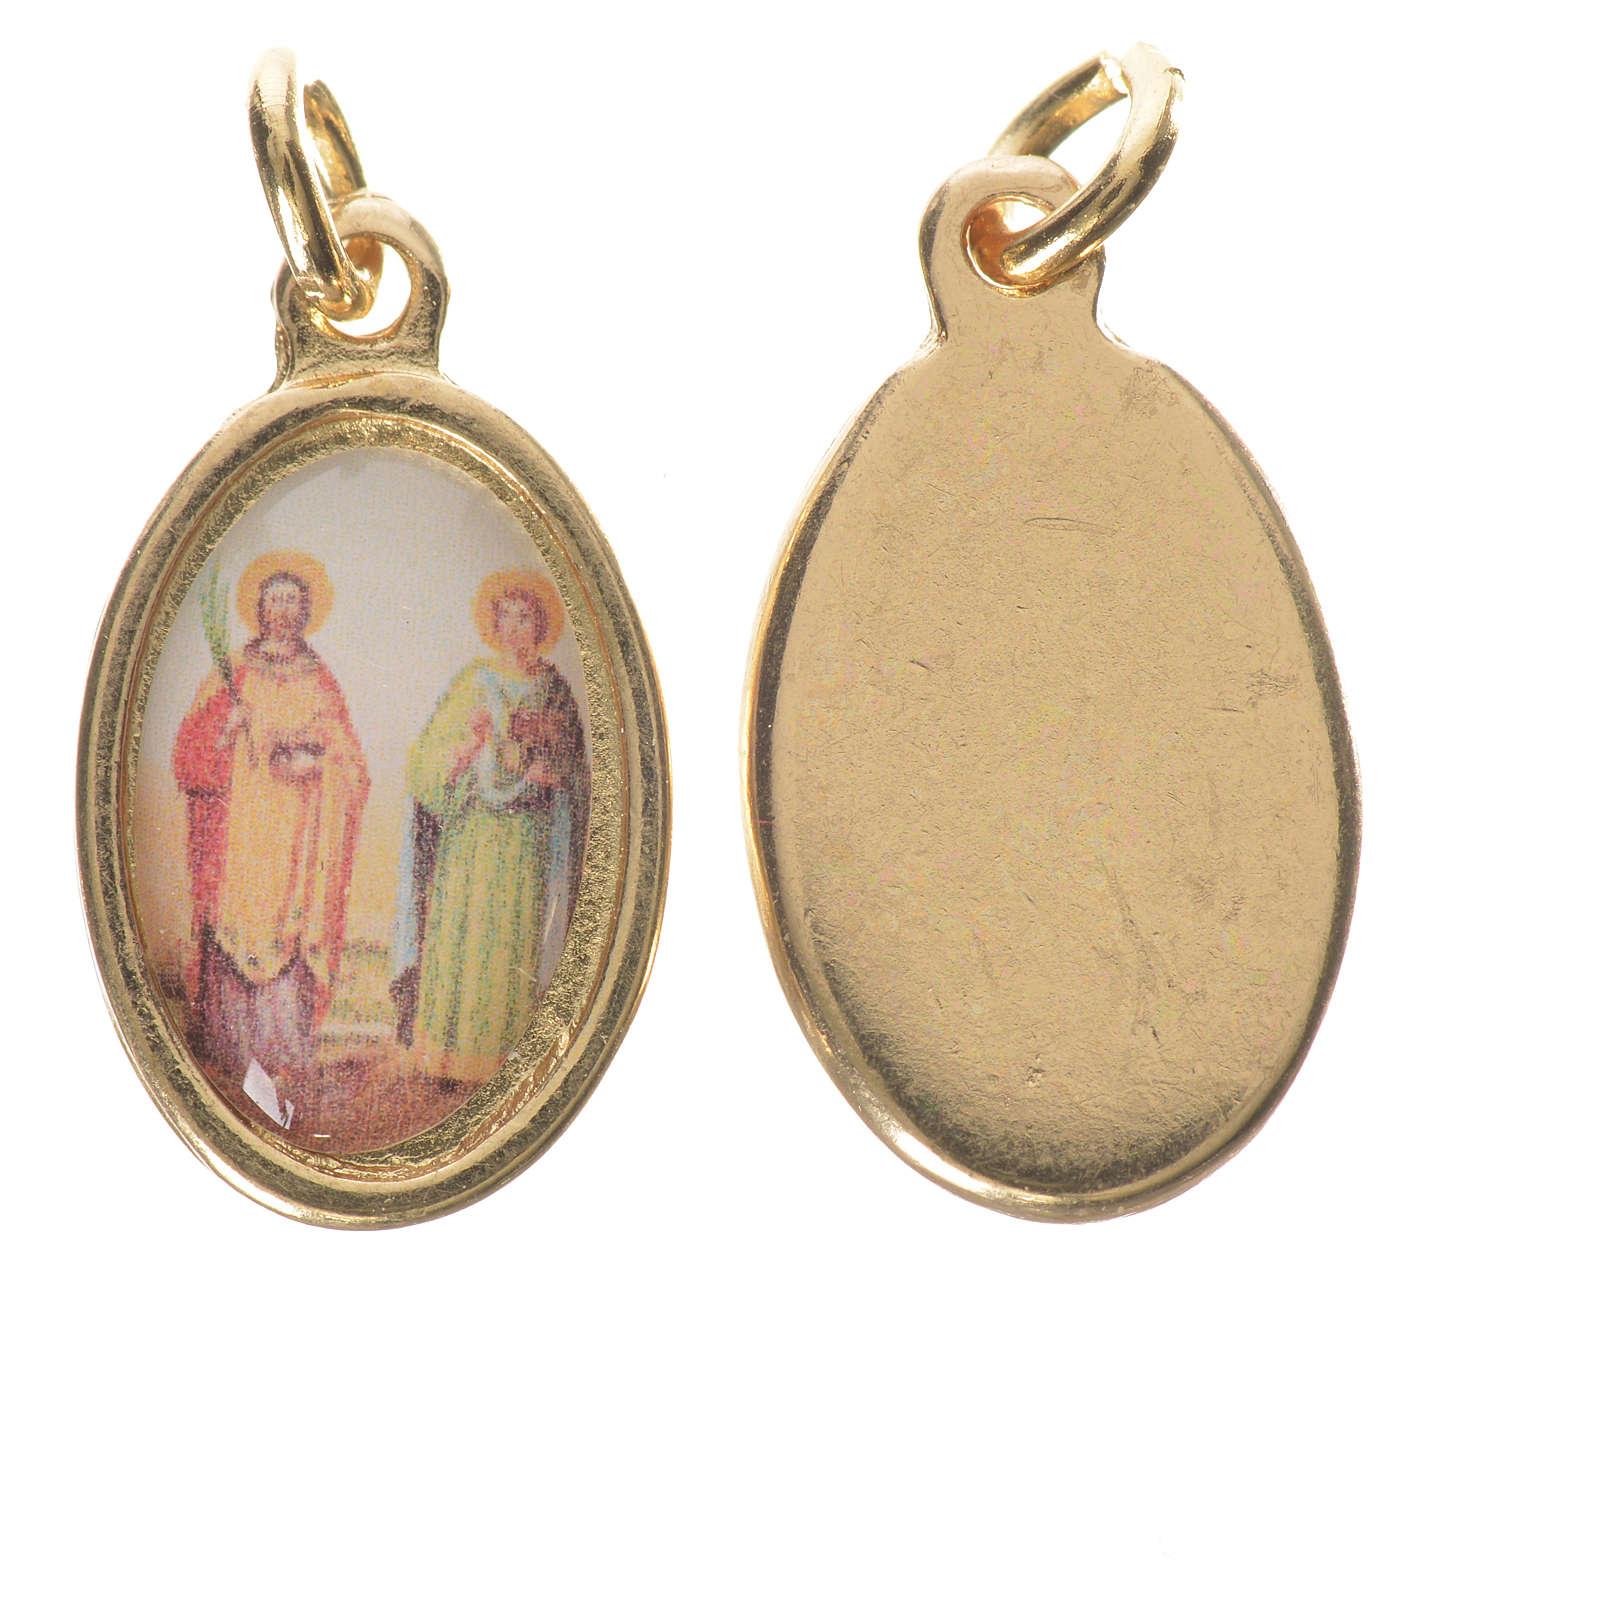 Saints Cosmas and Damian medal in golden metal, 1.5cm 4